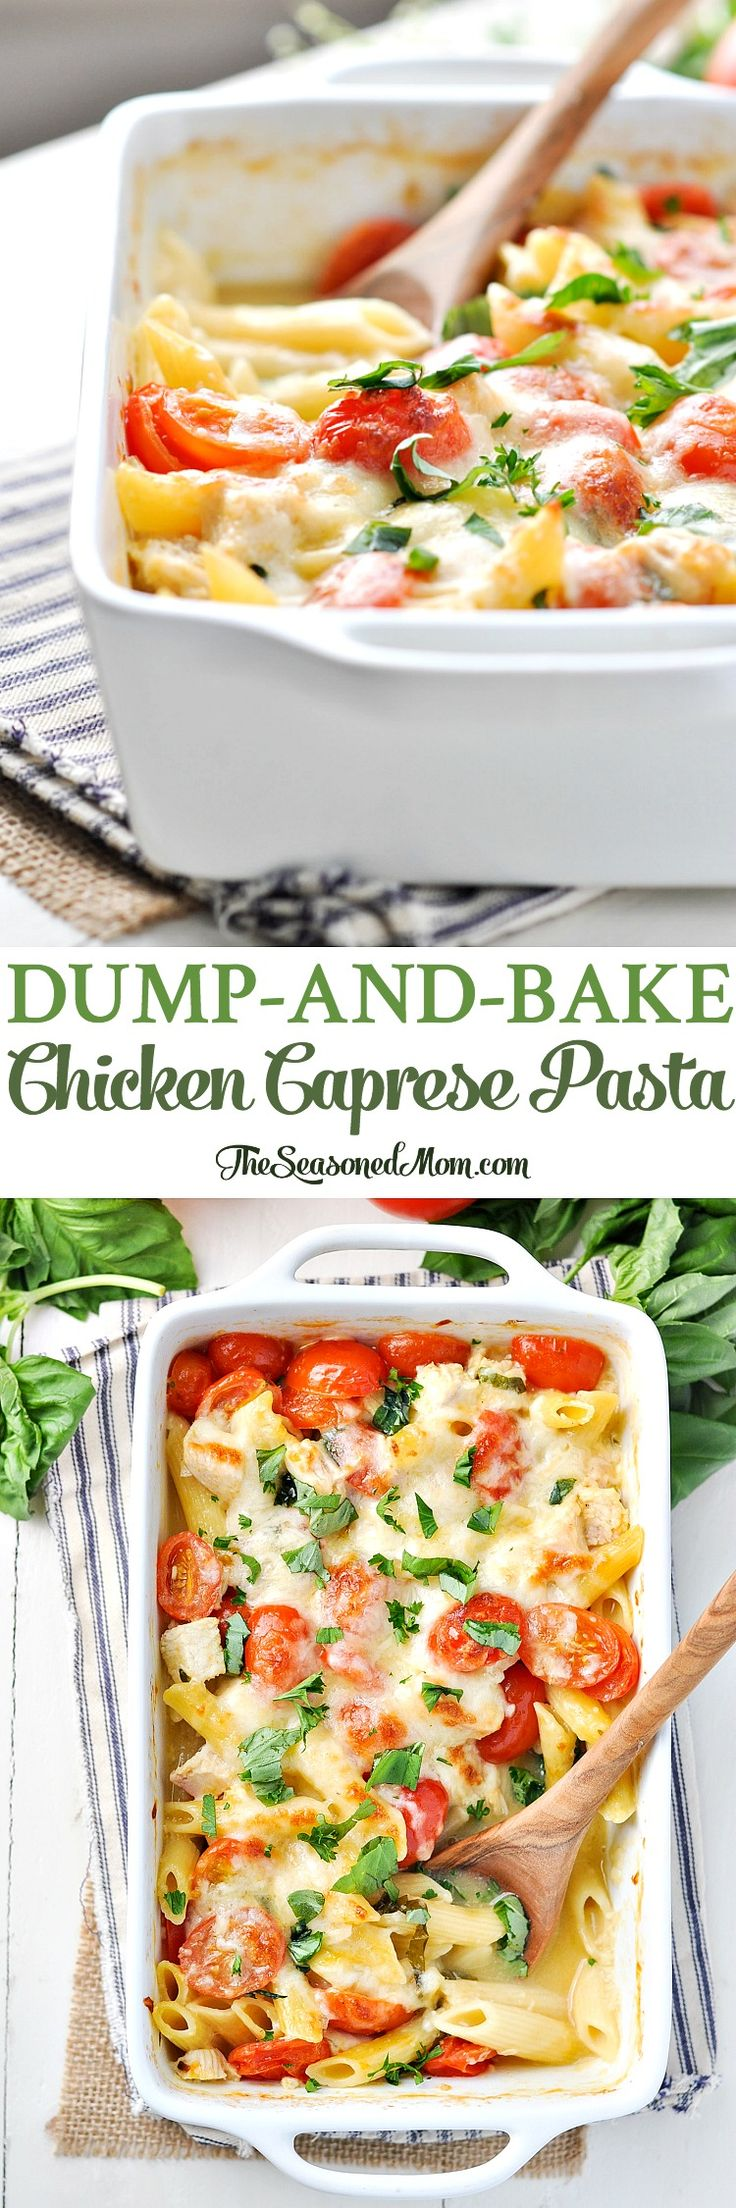 Dump-and-Bake Chicken Caprese Pasta! Easy Dinner Recipes   Healthy Dinner Recipes   Dinner Ideas   Healthy Recipes Easy   Healthy Dinners   Chicken Recipes   Pasta Recipes   Italian Recipes